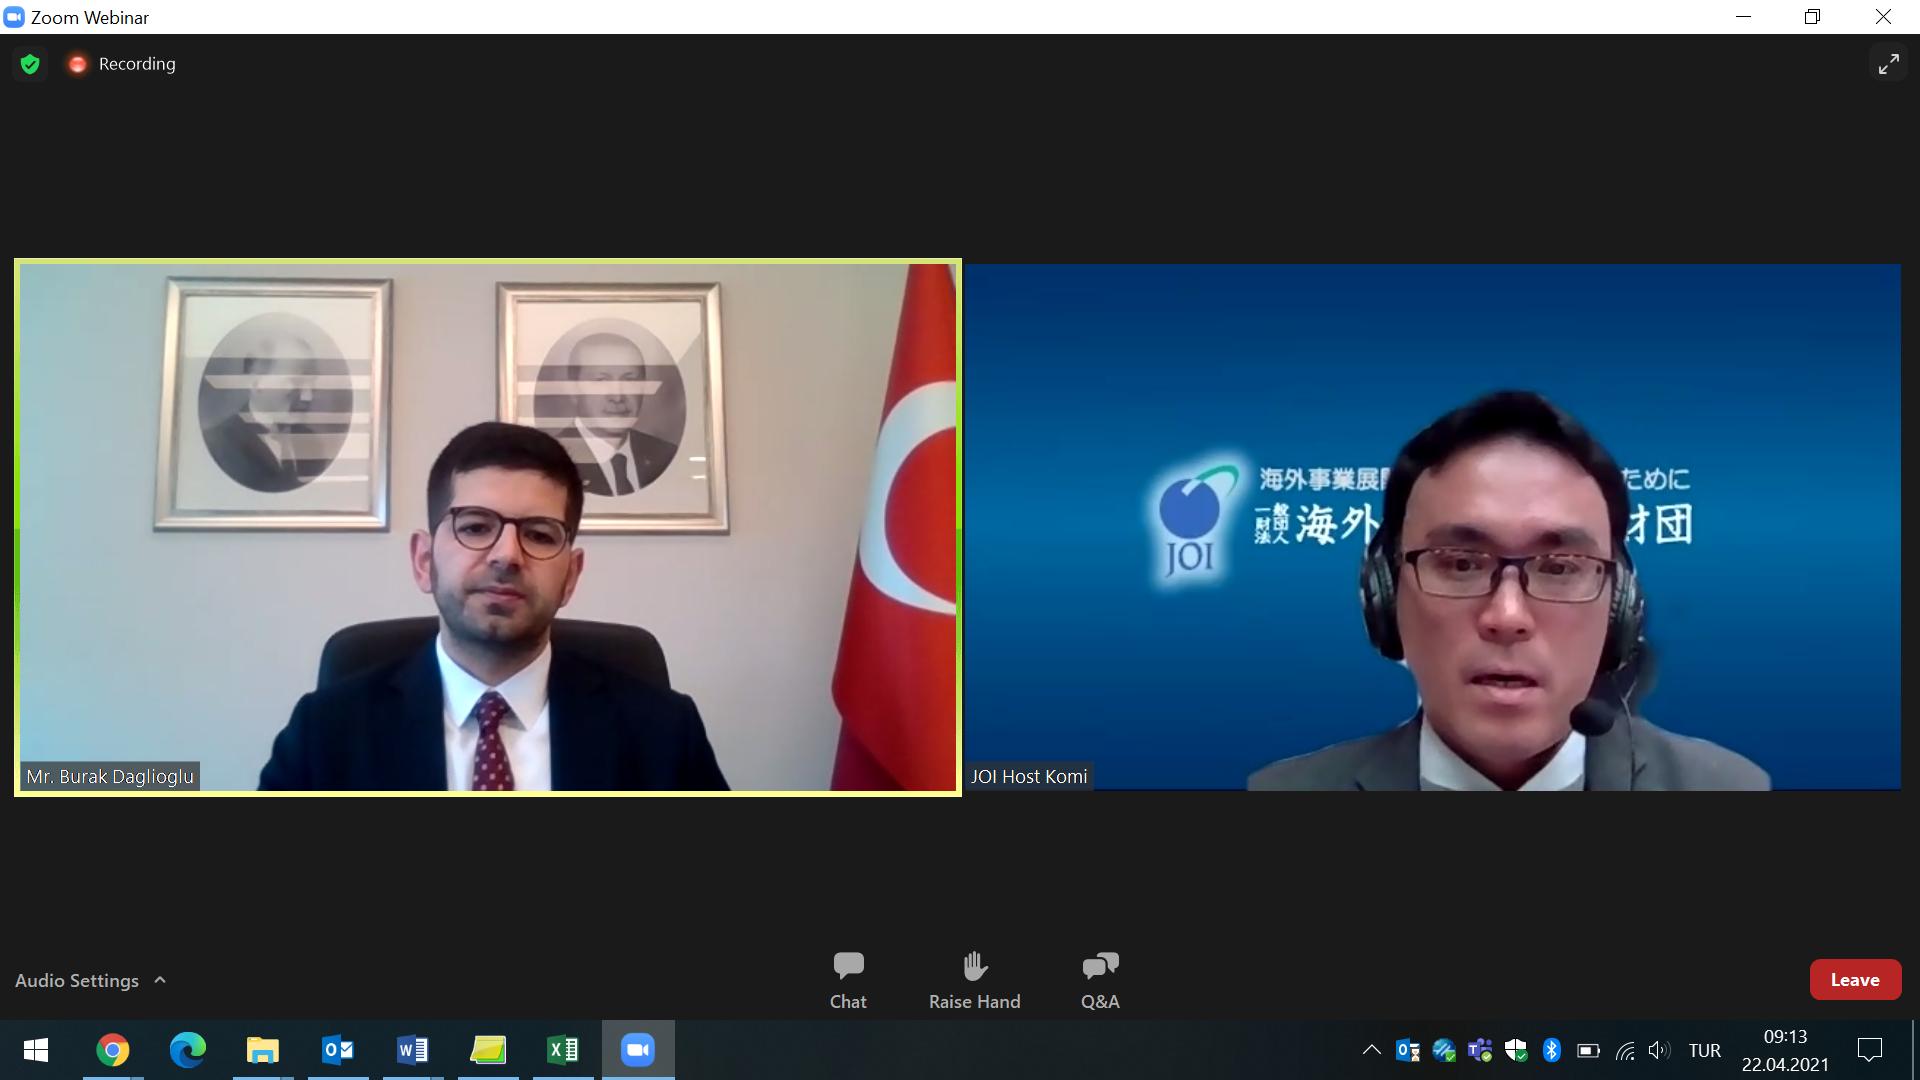 Image of Investment Office President A. Burak Dağlıoğlu at a Webinar